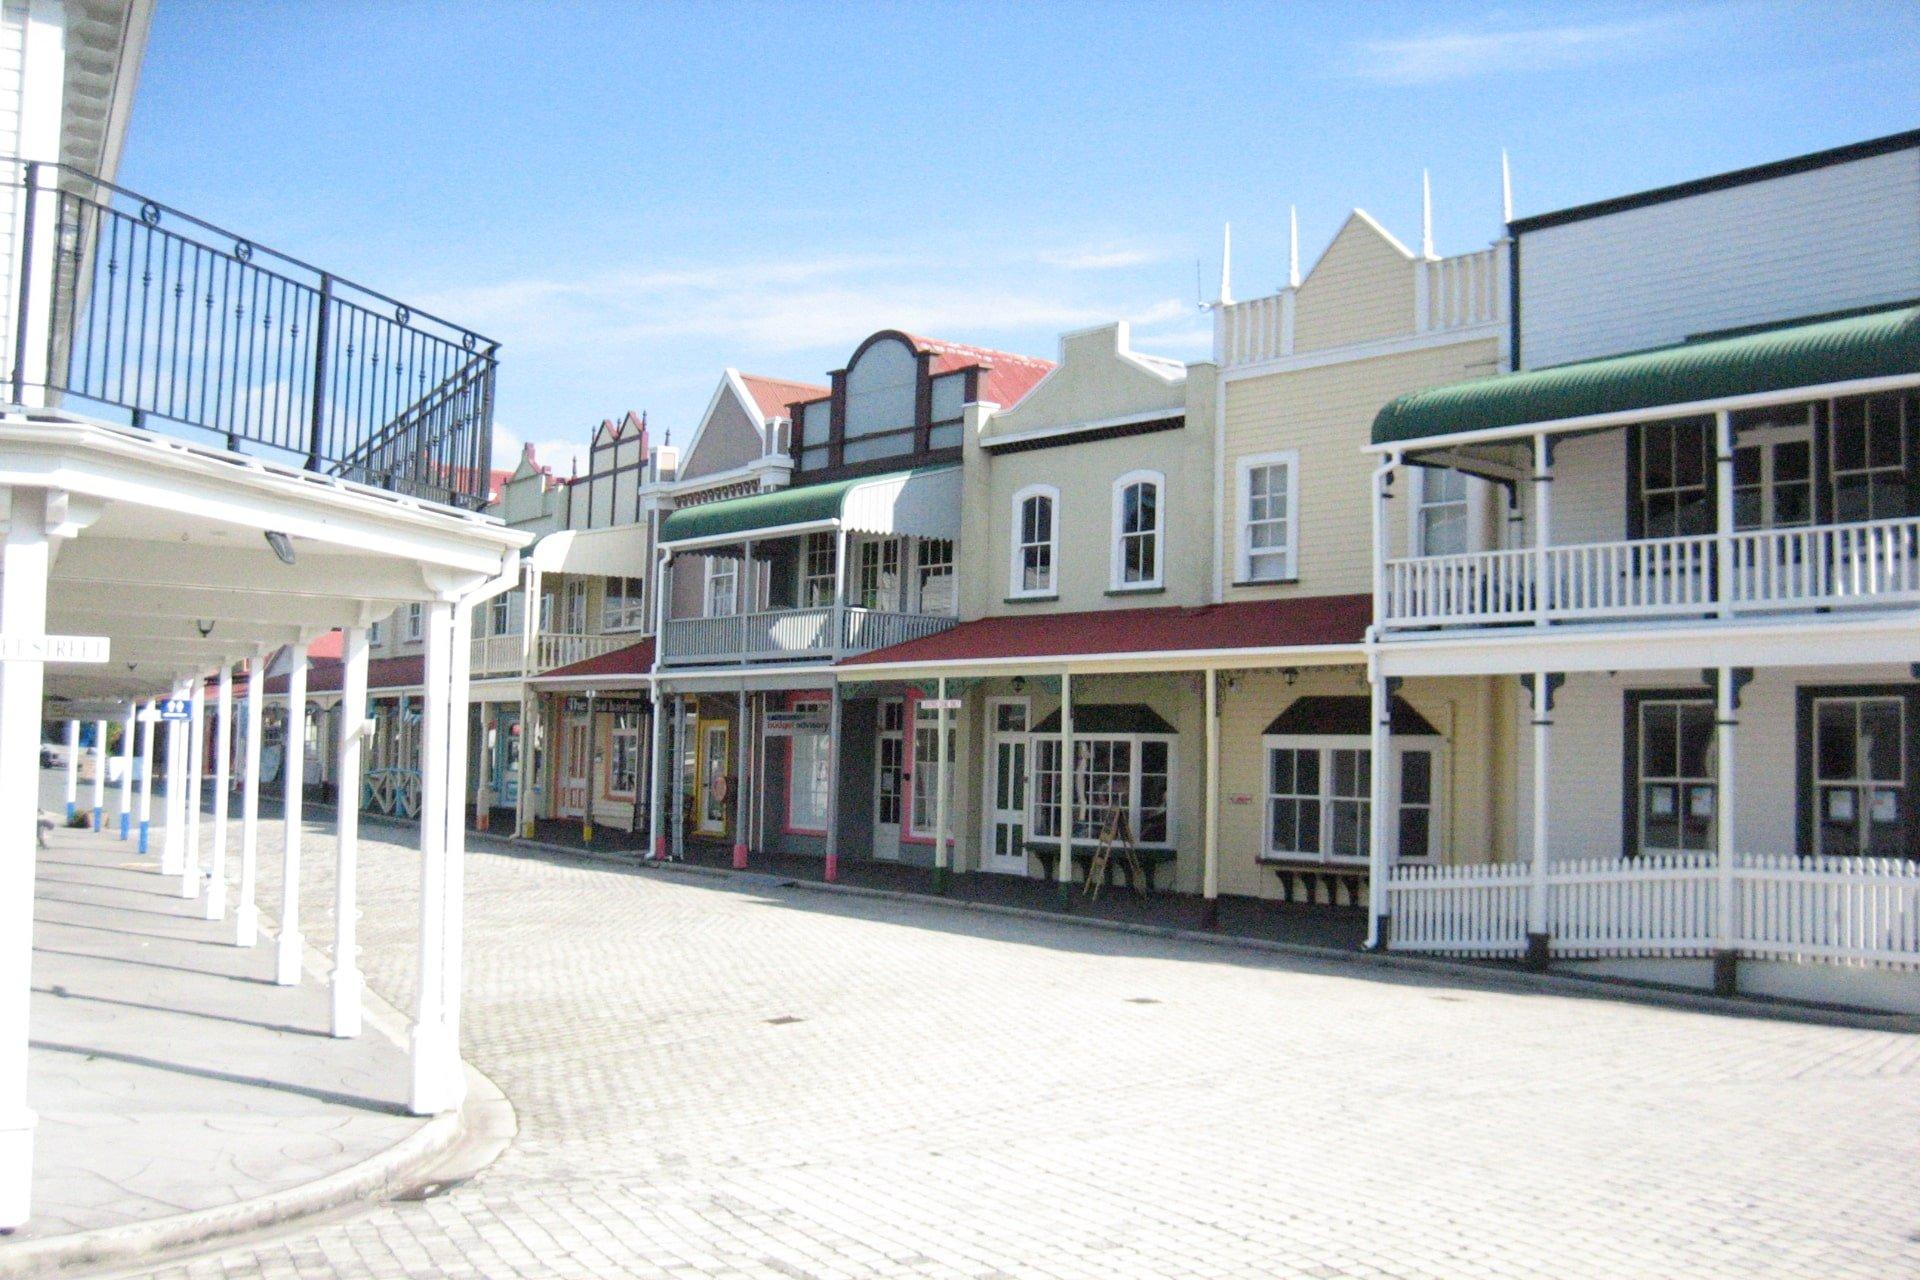 Tauranga Historic Village